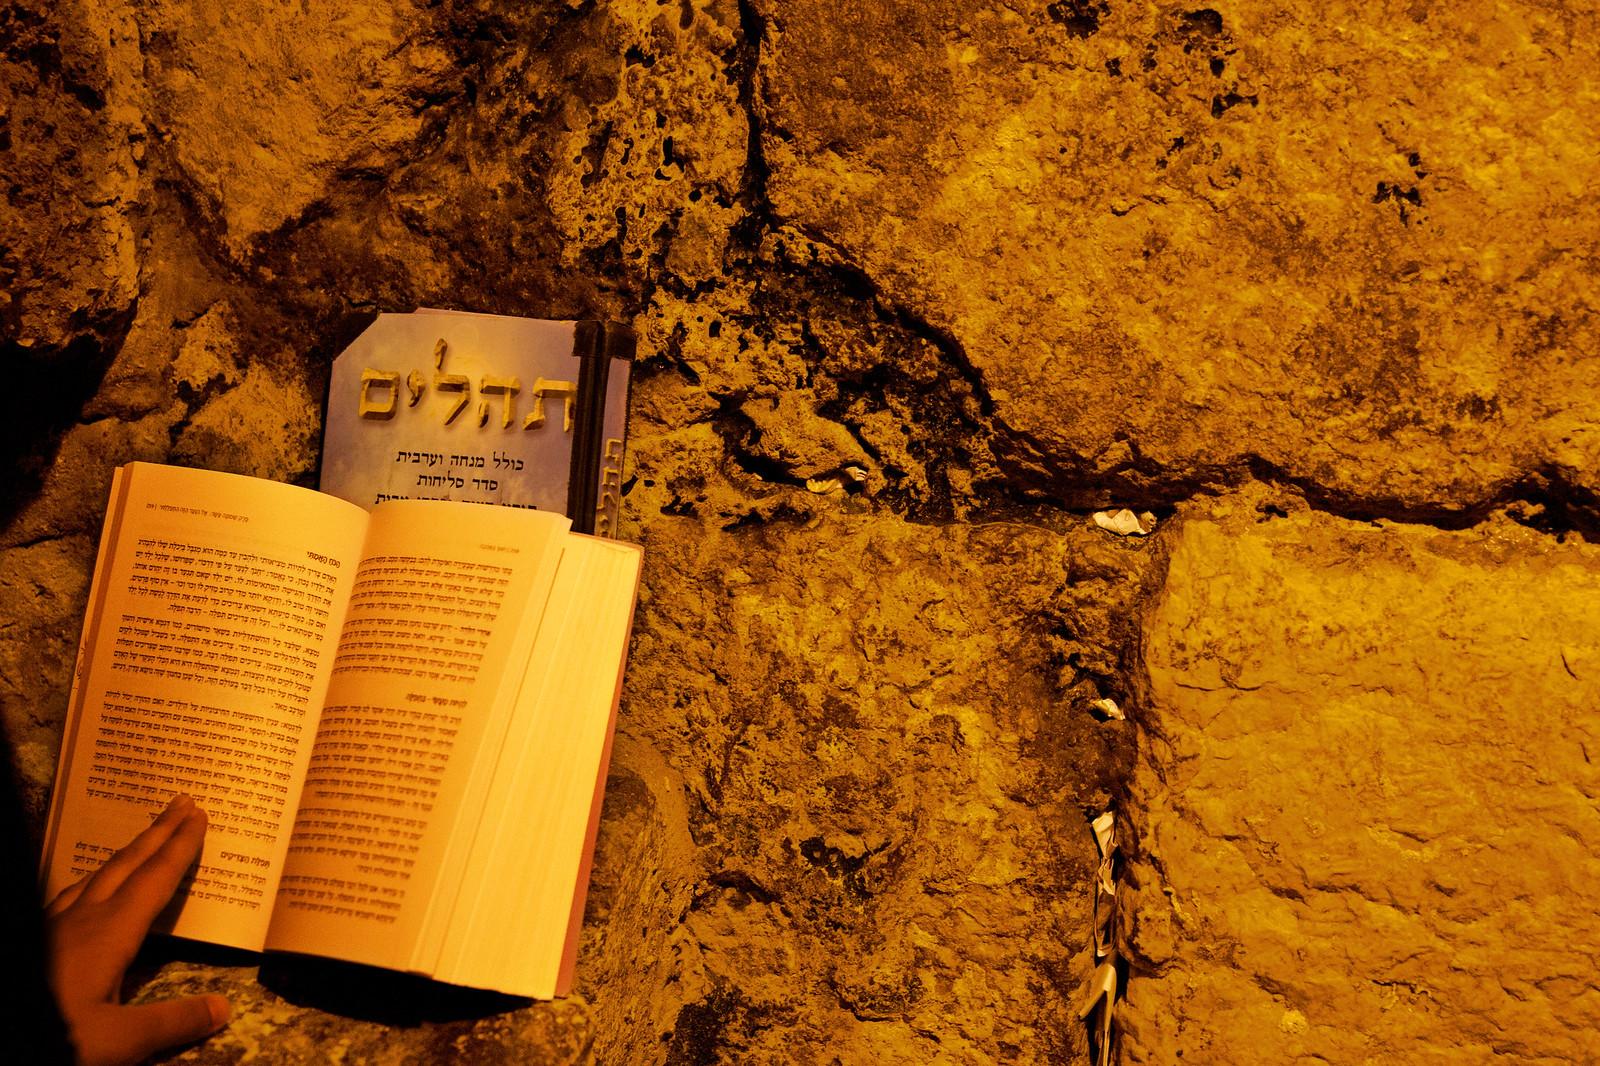 Jerusalem_Western Wall Tunnels_5_Noam Chen_IMOT